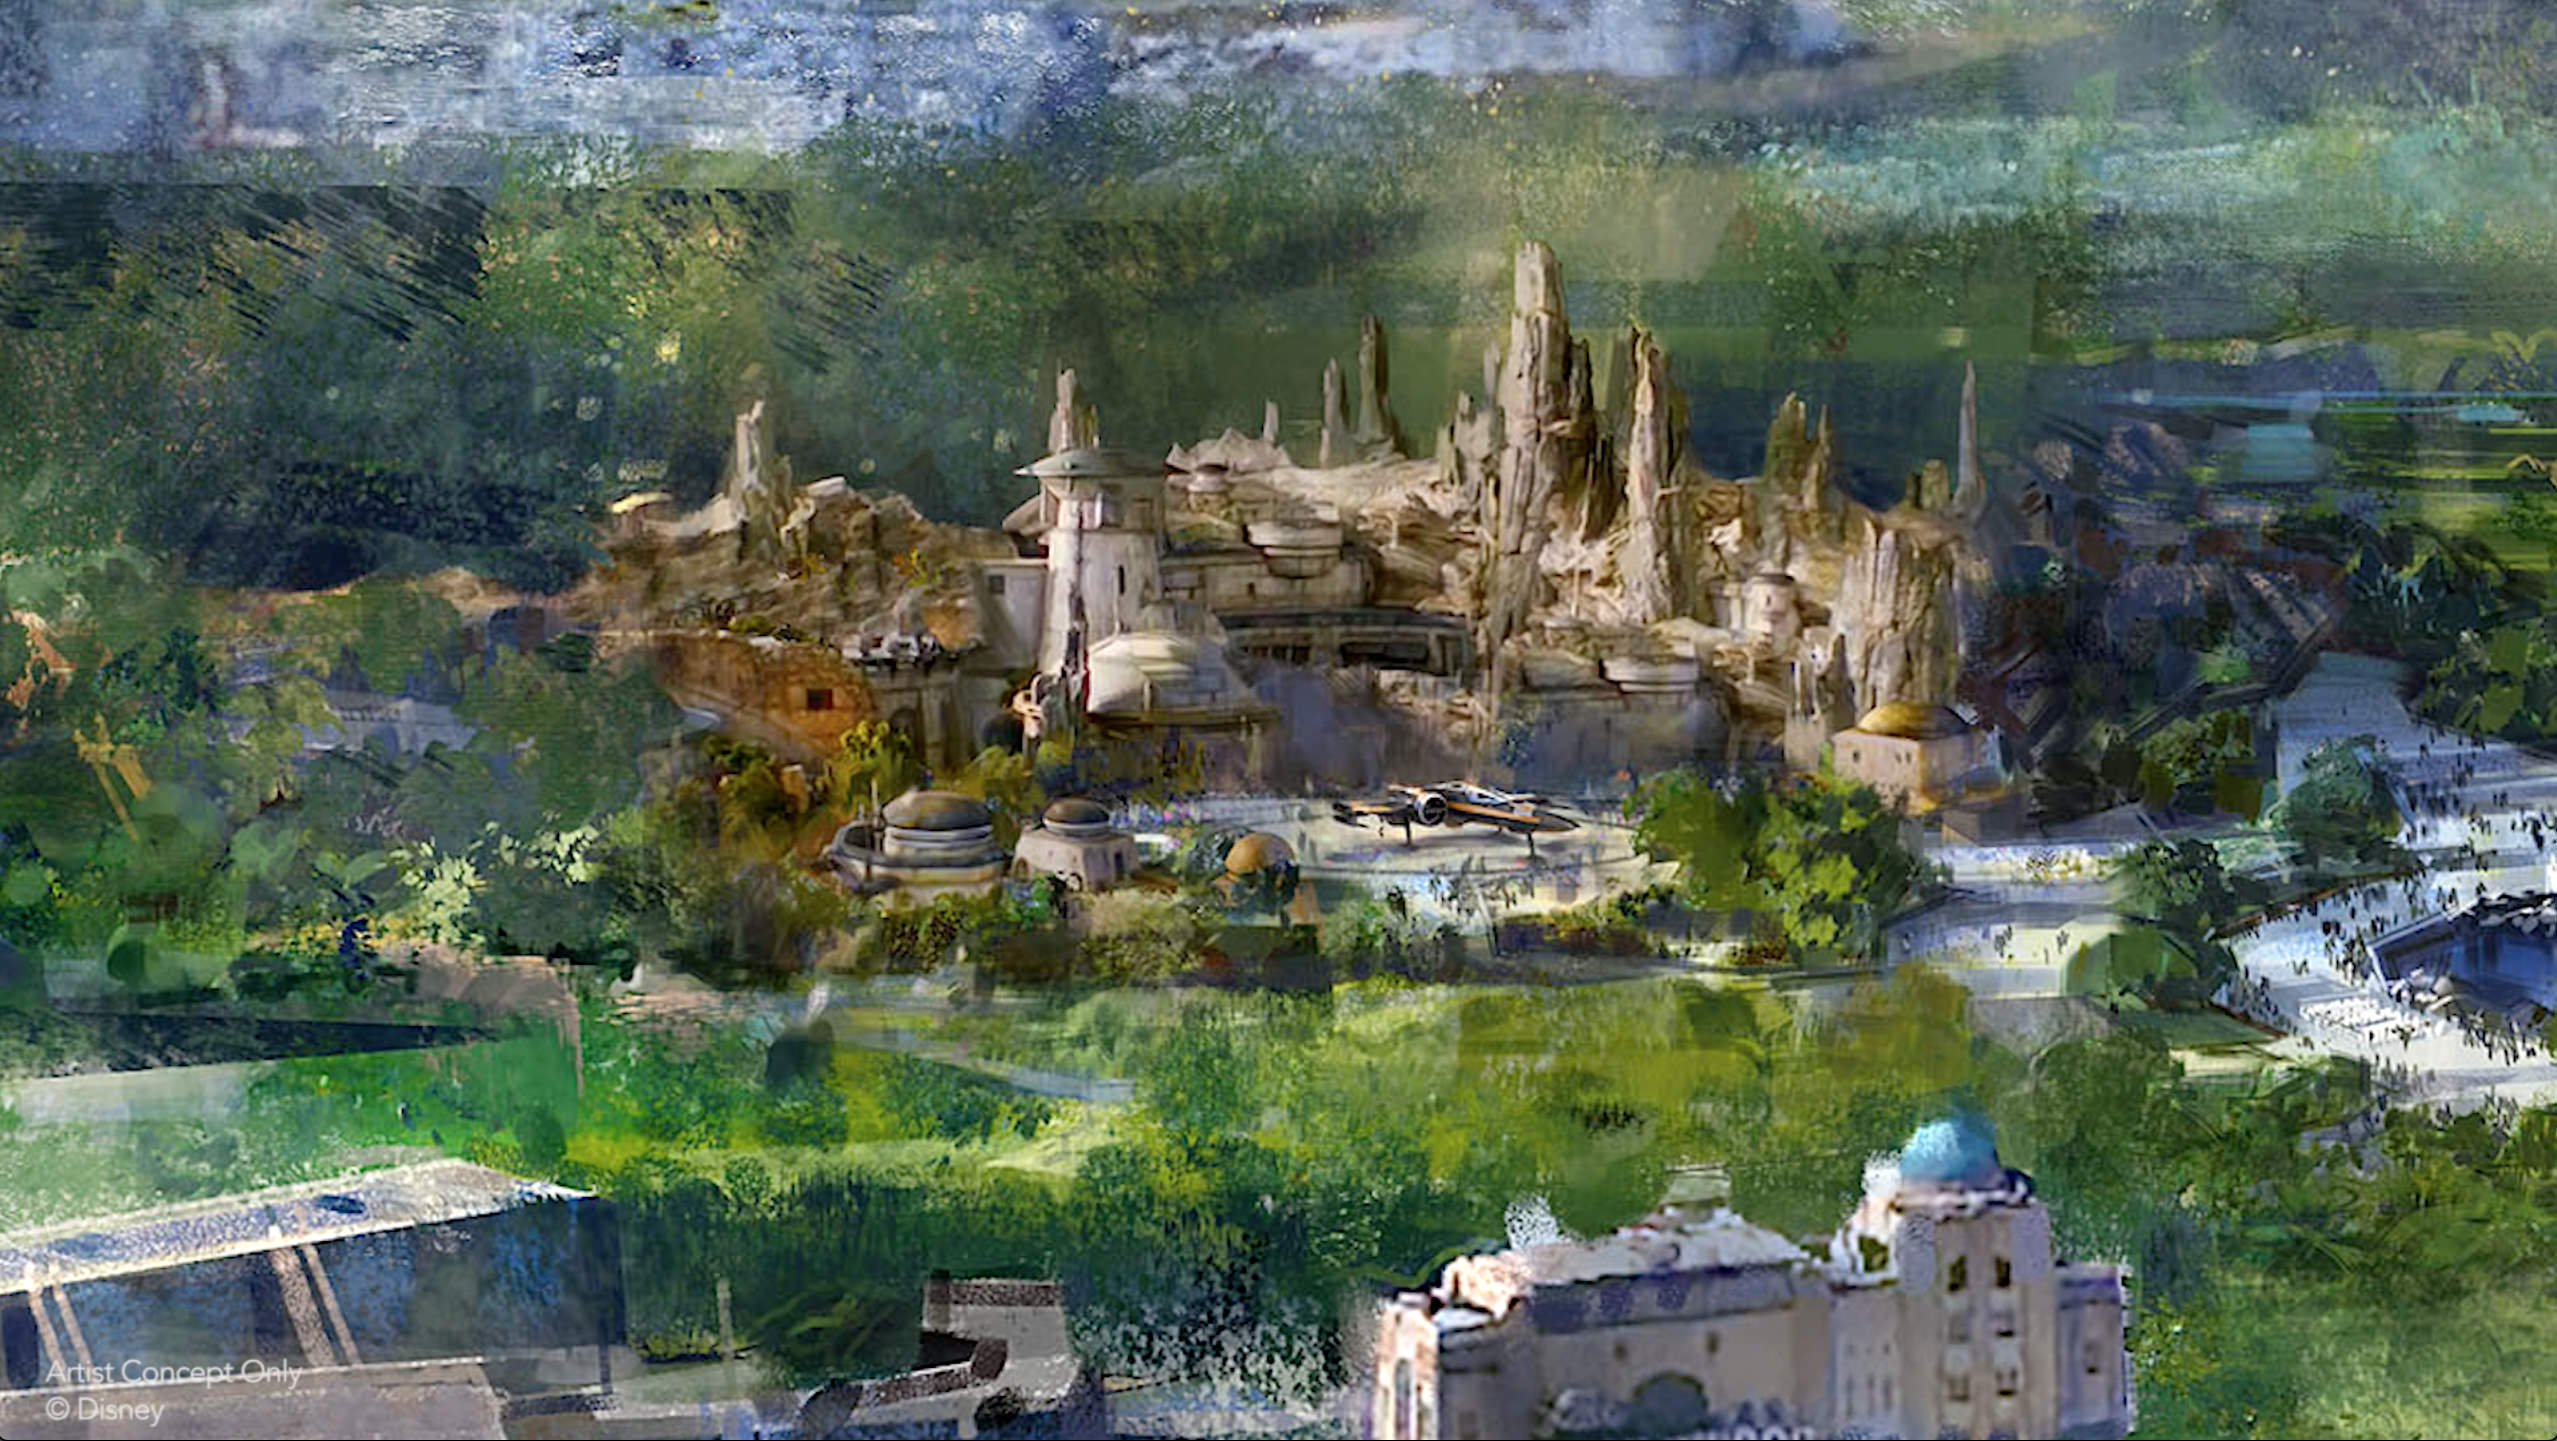 Walt-Disney-studios-Makeover-Extension-2021--STAR-WARS-LAND